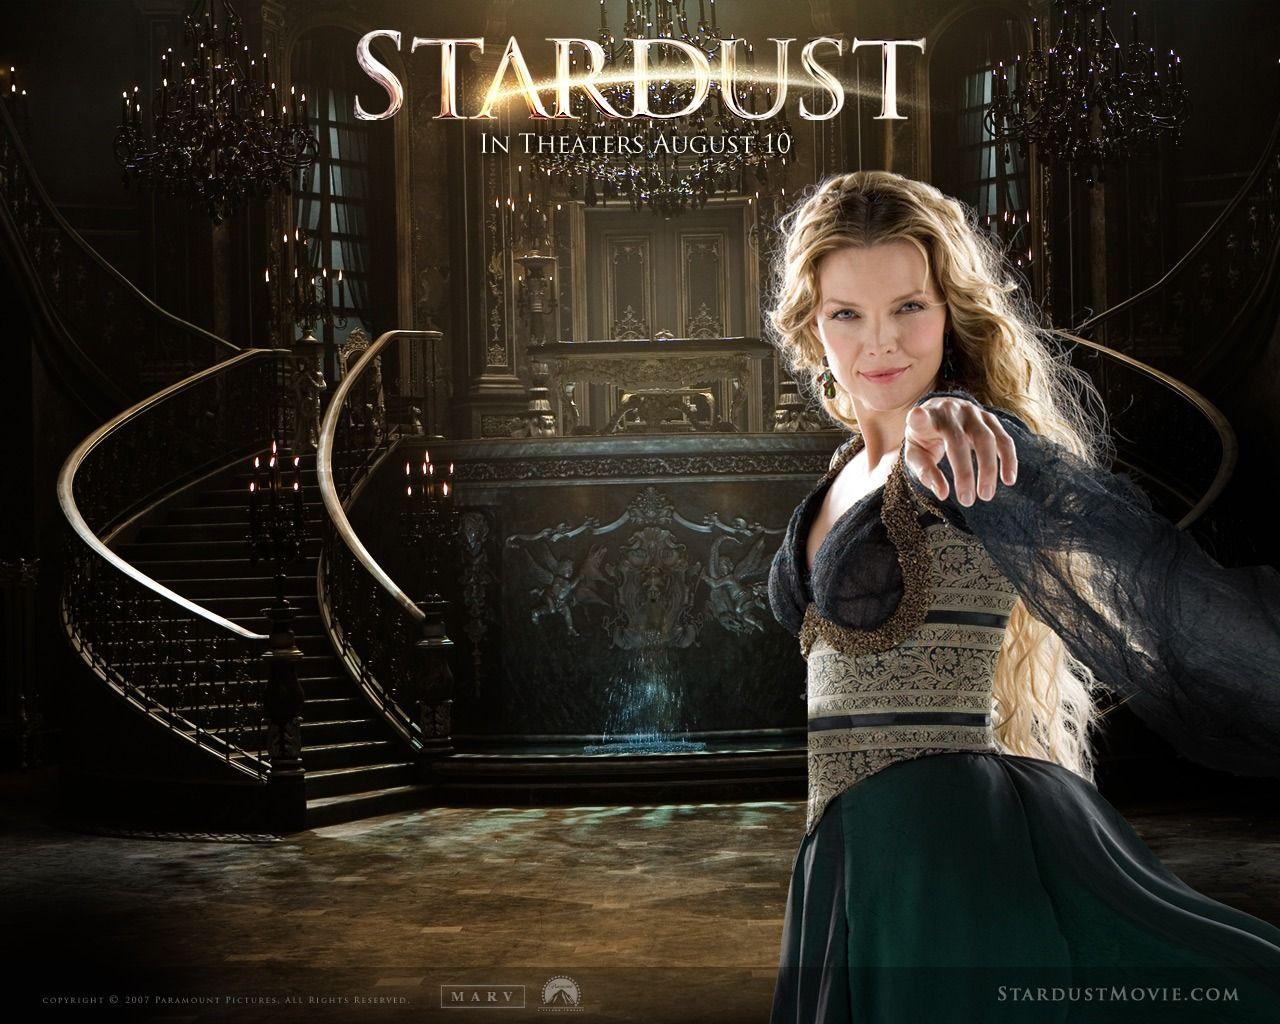 Wonderful Wallpaper Movie Stardust - 9df993658040647cddbadc6950024a98  Pic_788485.jpg